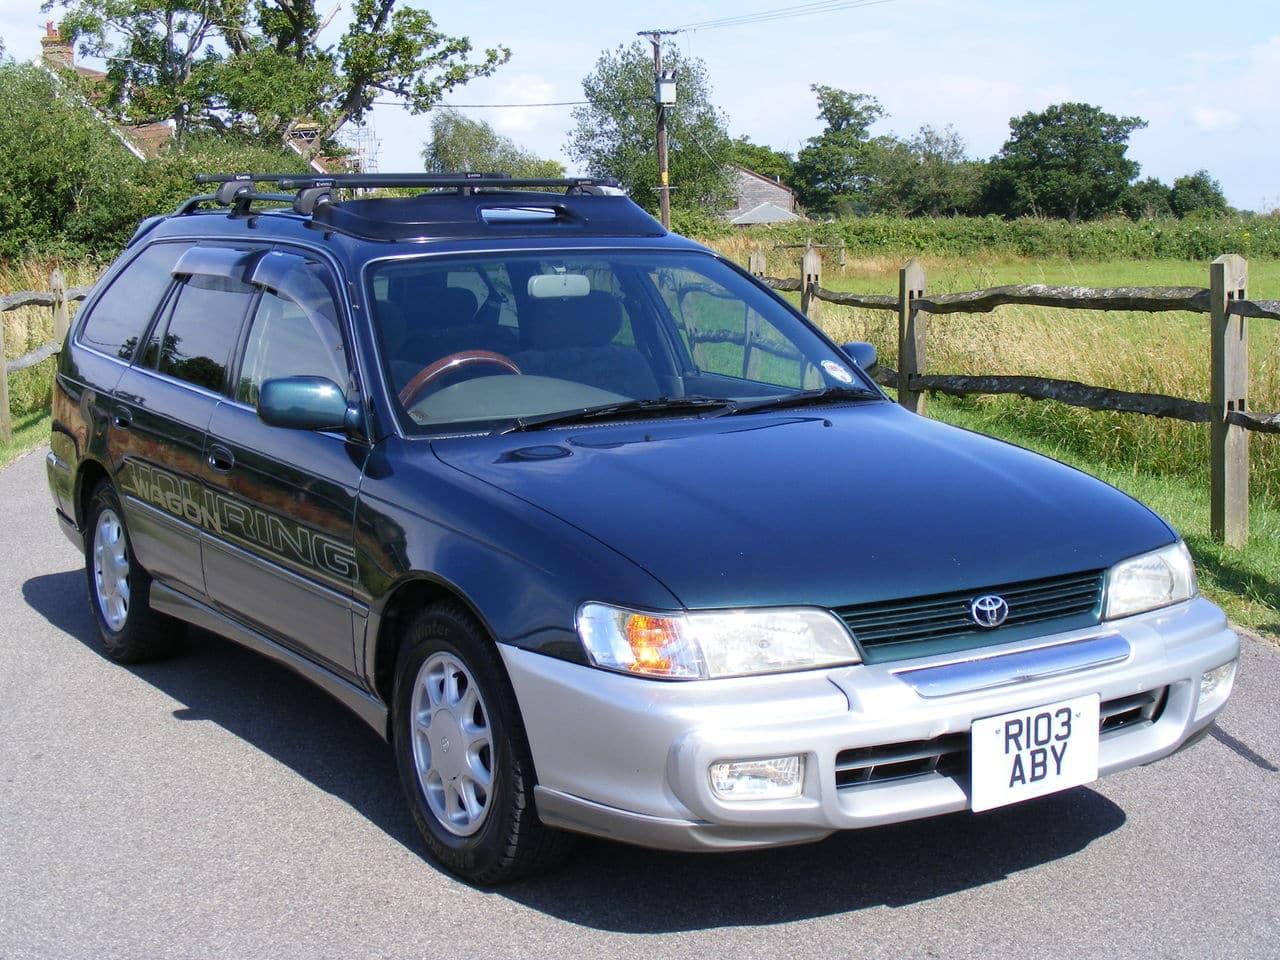 Toyota Corolla 1.6 family car Picture_2927